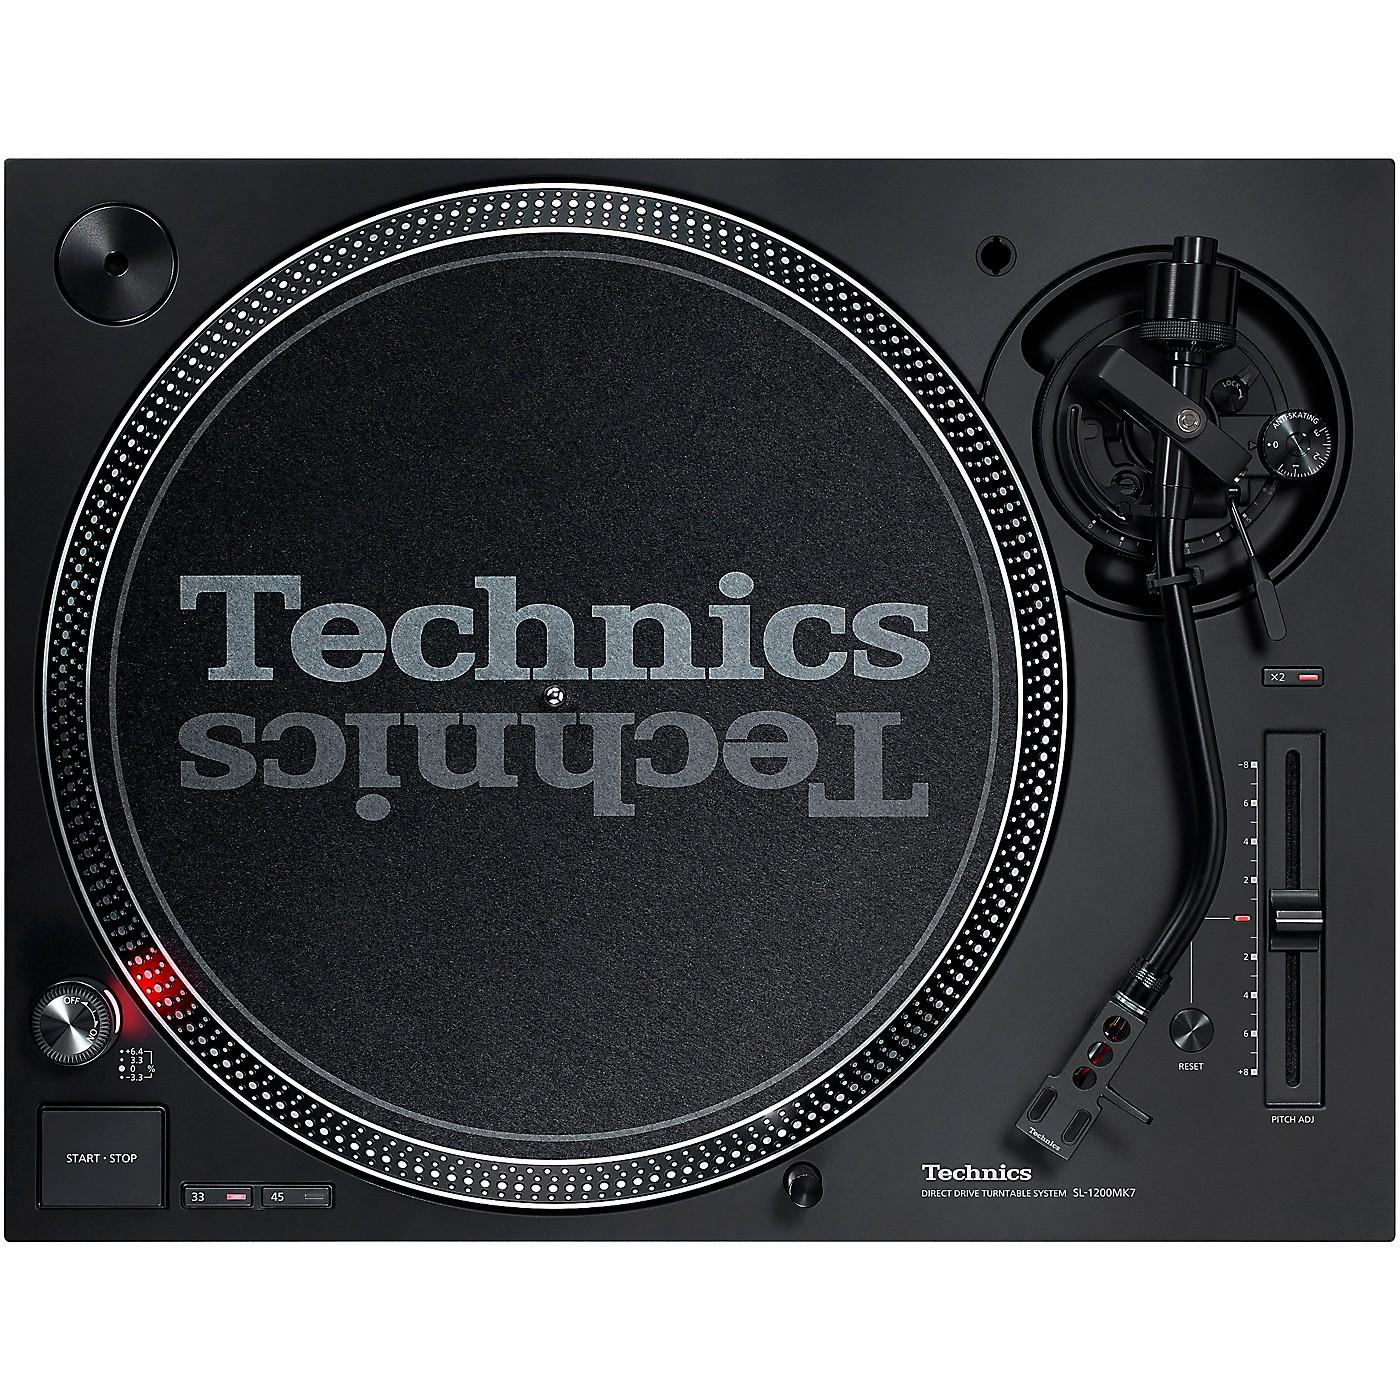 Technics SL-1200MK7 Direct-Drive Professional DJ Turntable thumbnail